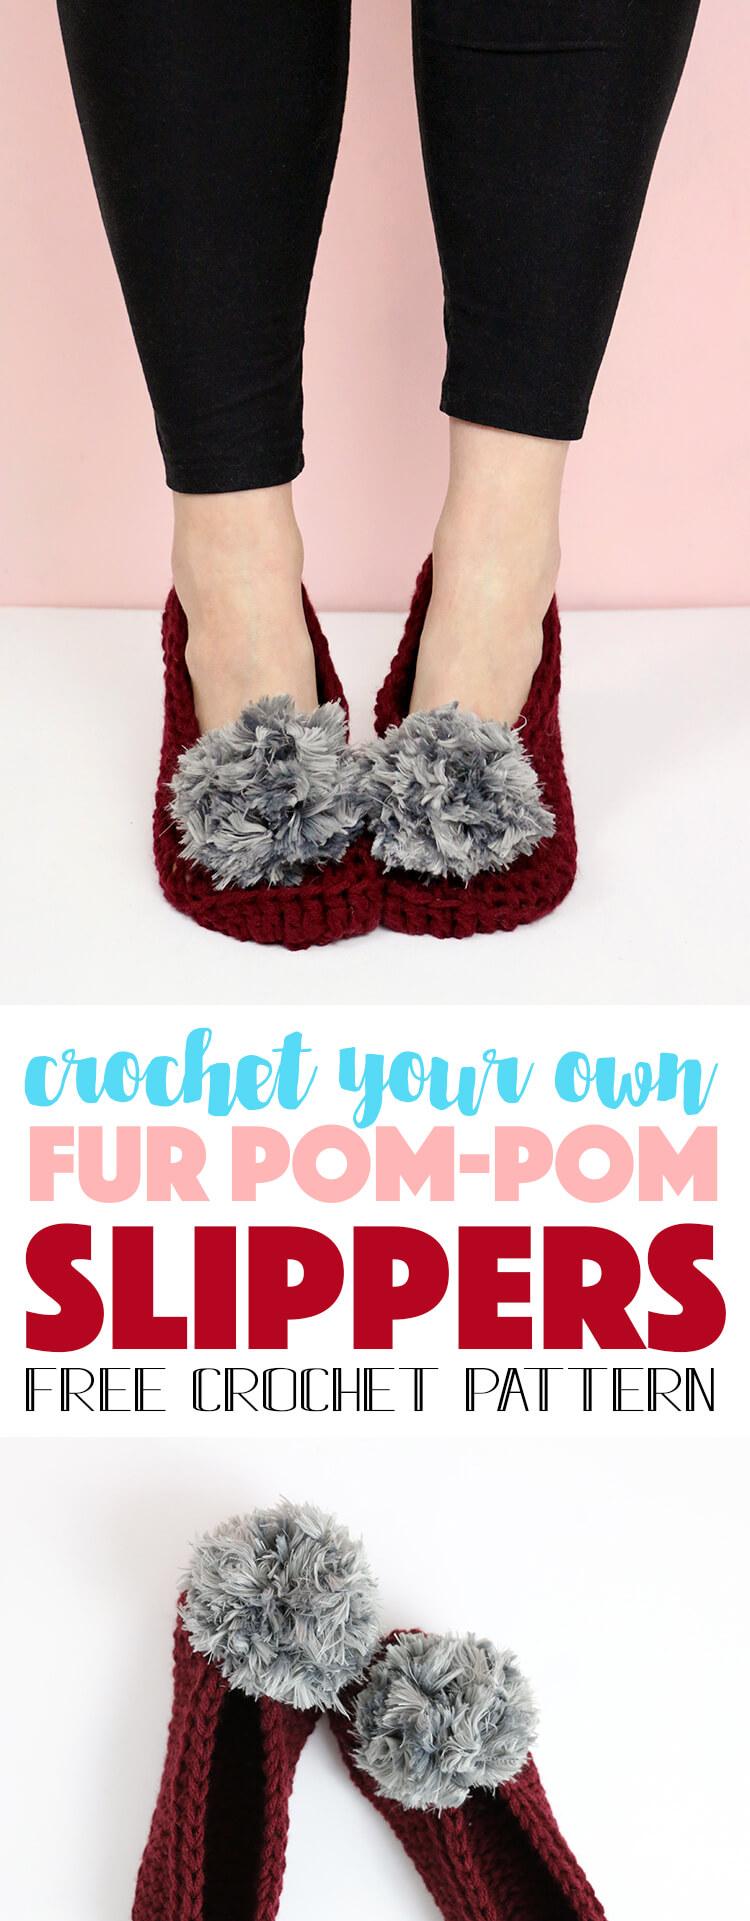 how to crochet slippers - free fur pom-pom slippers pattern